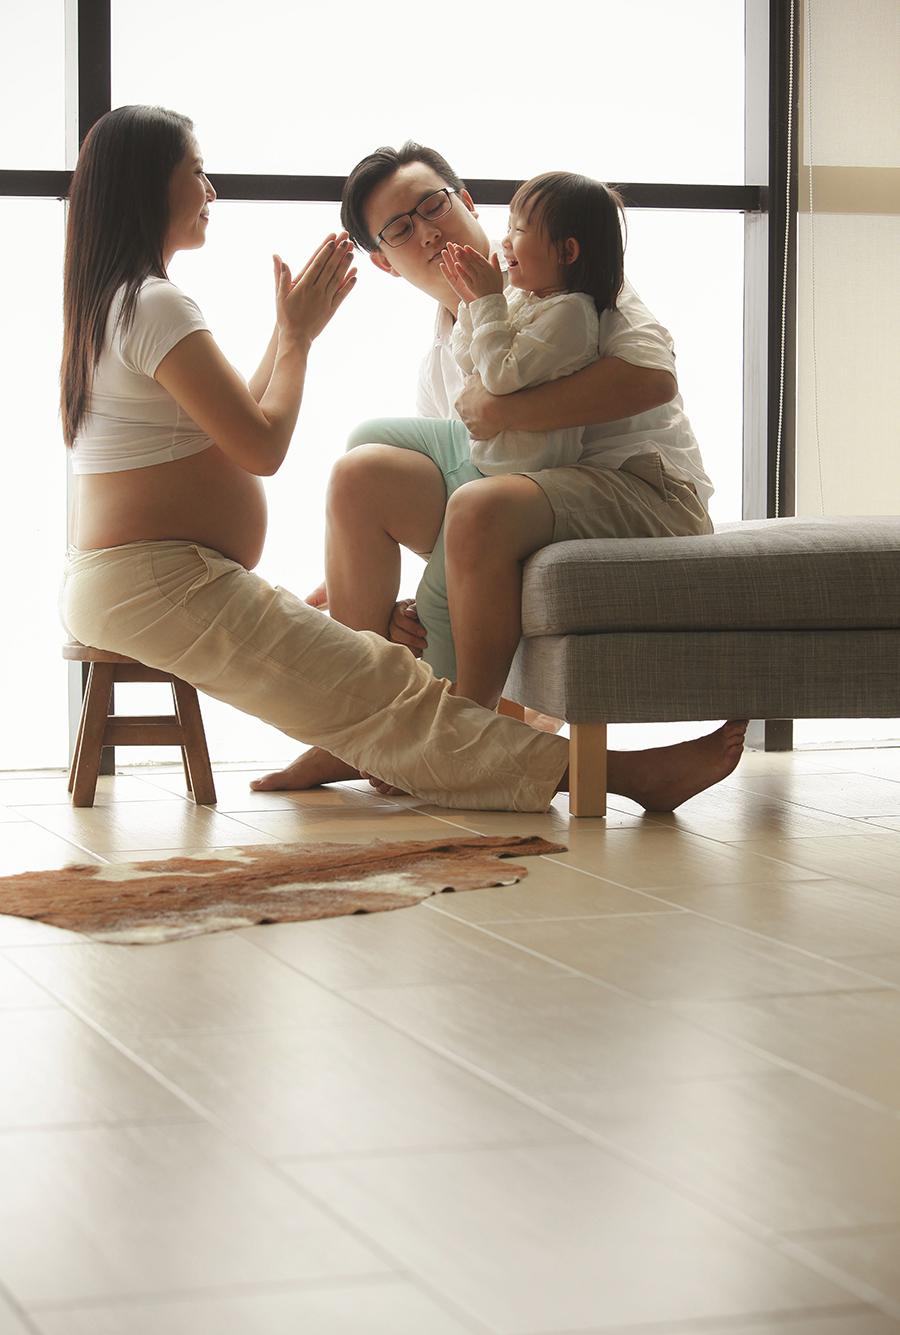 maternity + family portrait photography by kurt ahs . 9143.jpg